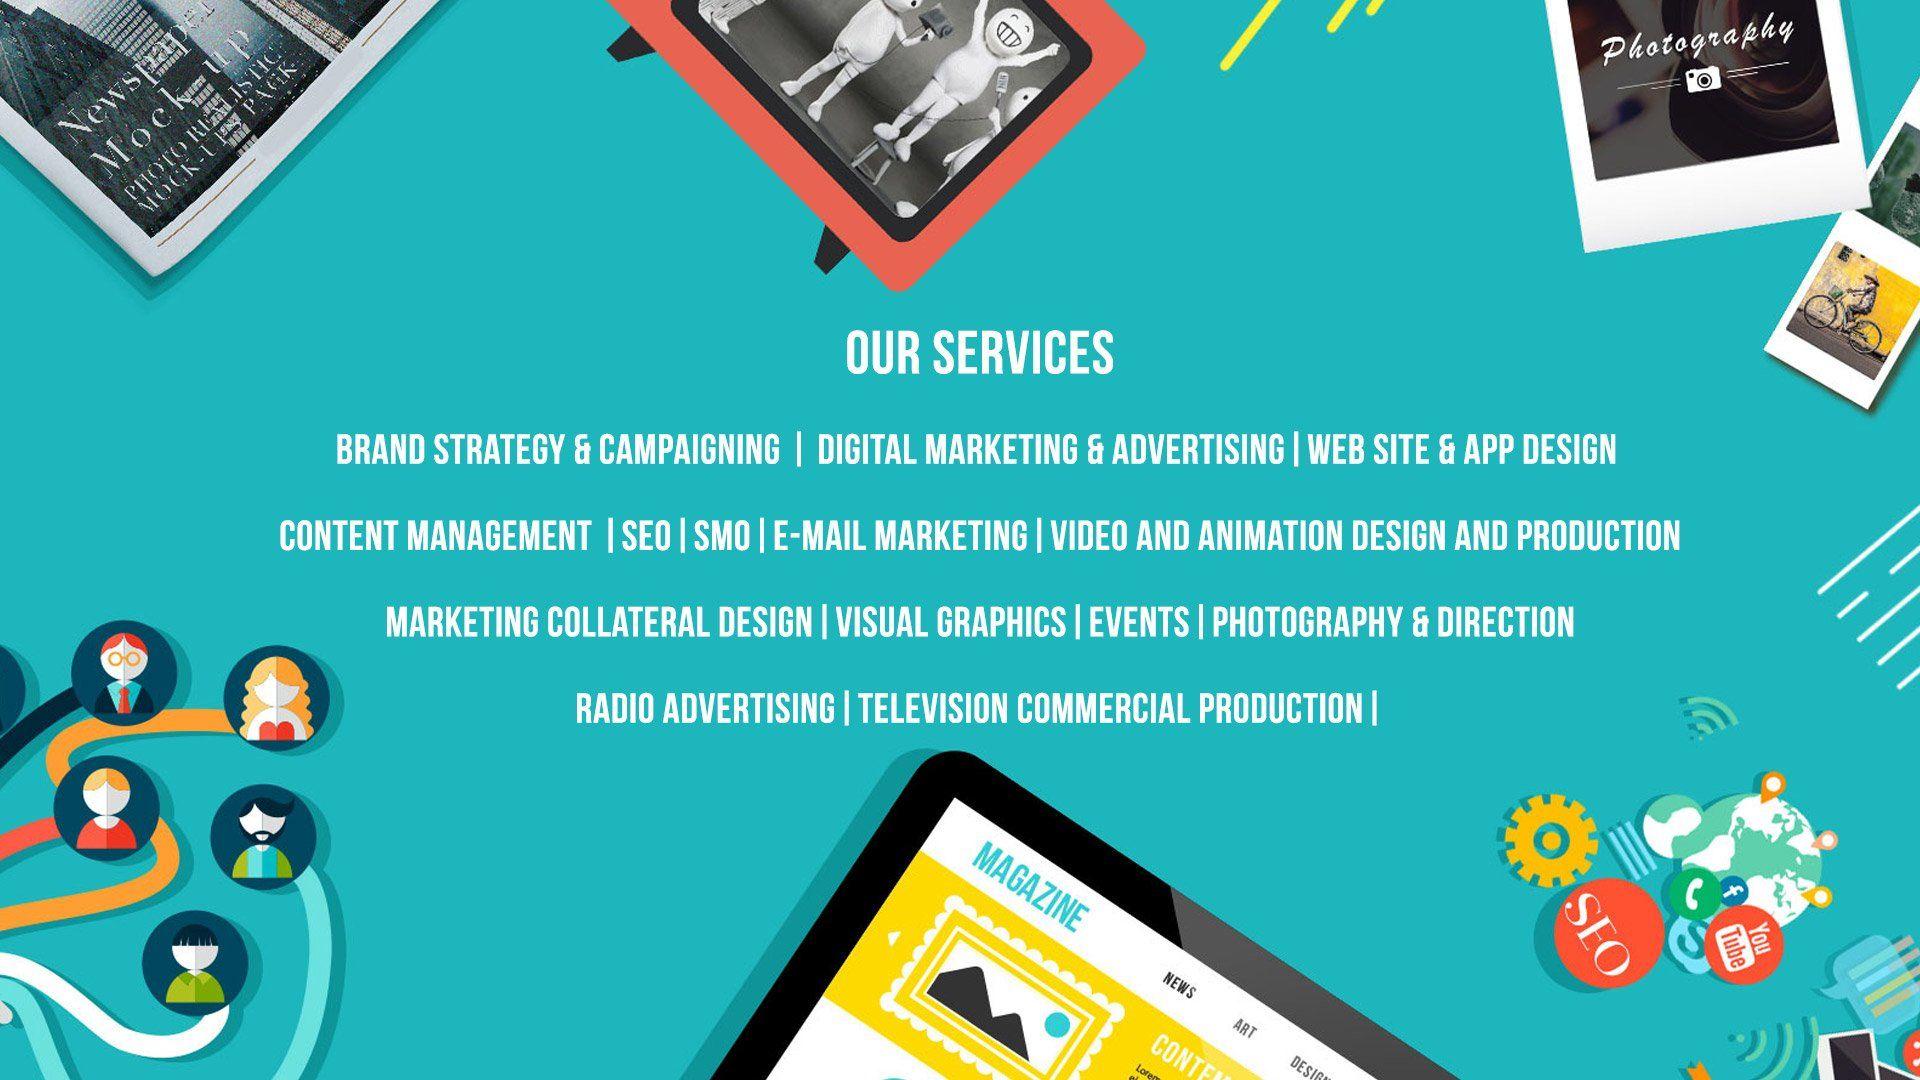 Pin by SaiAnudeep Anu on Digitalmarketingservices